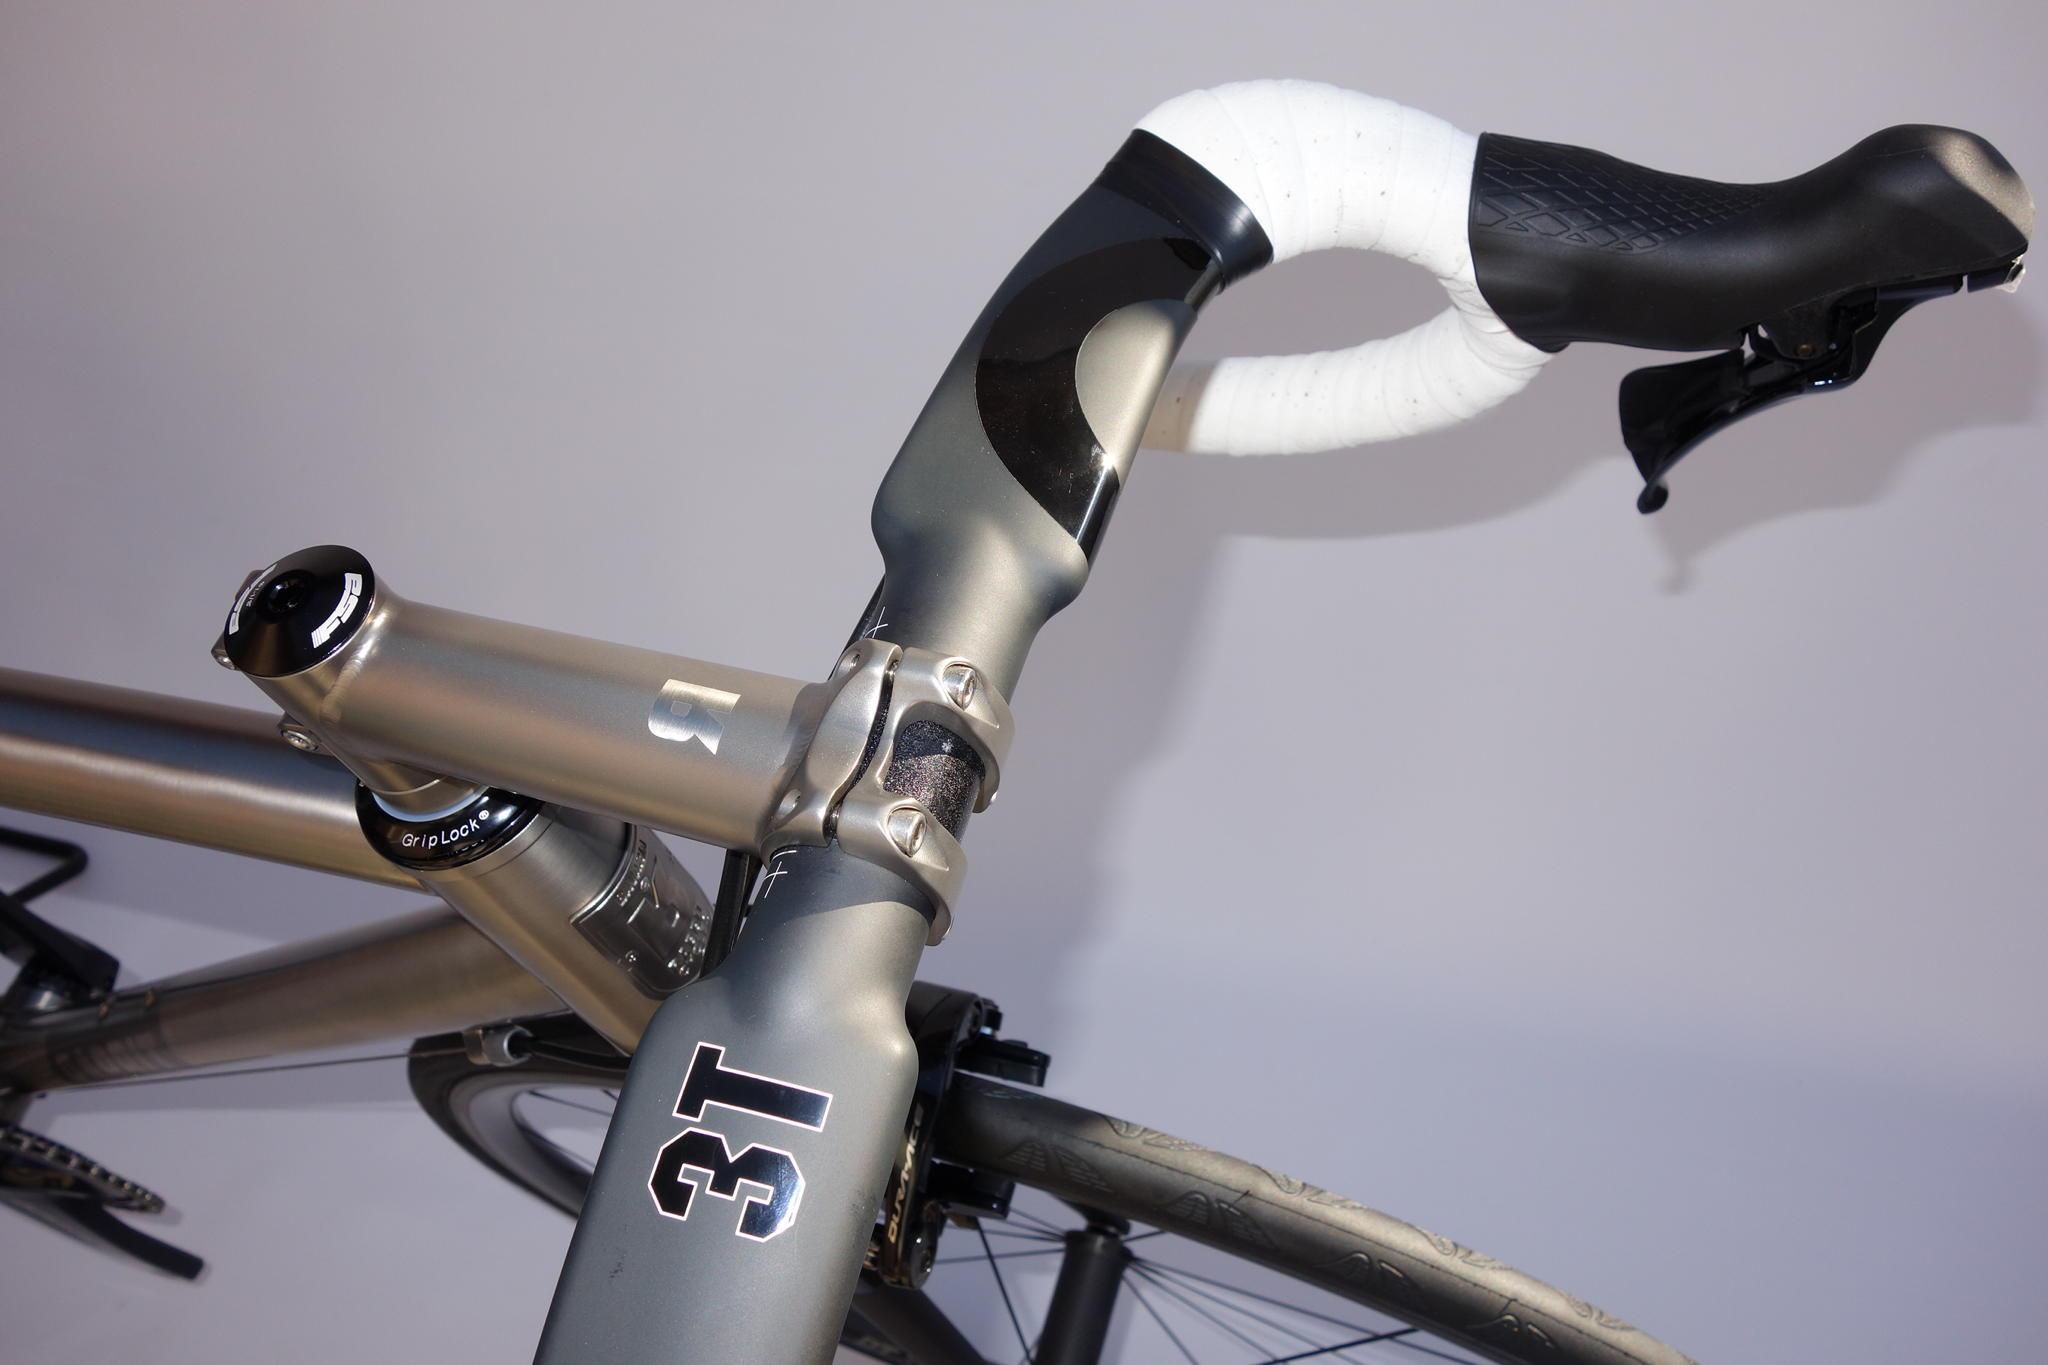 rabbit_cycles_titan_road_classic_dsc03054